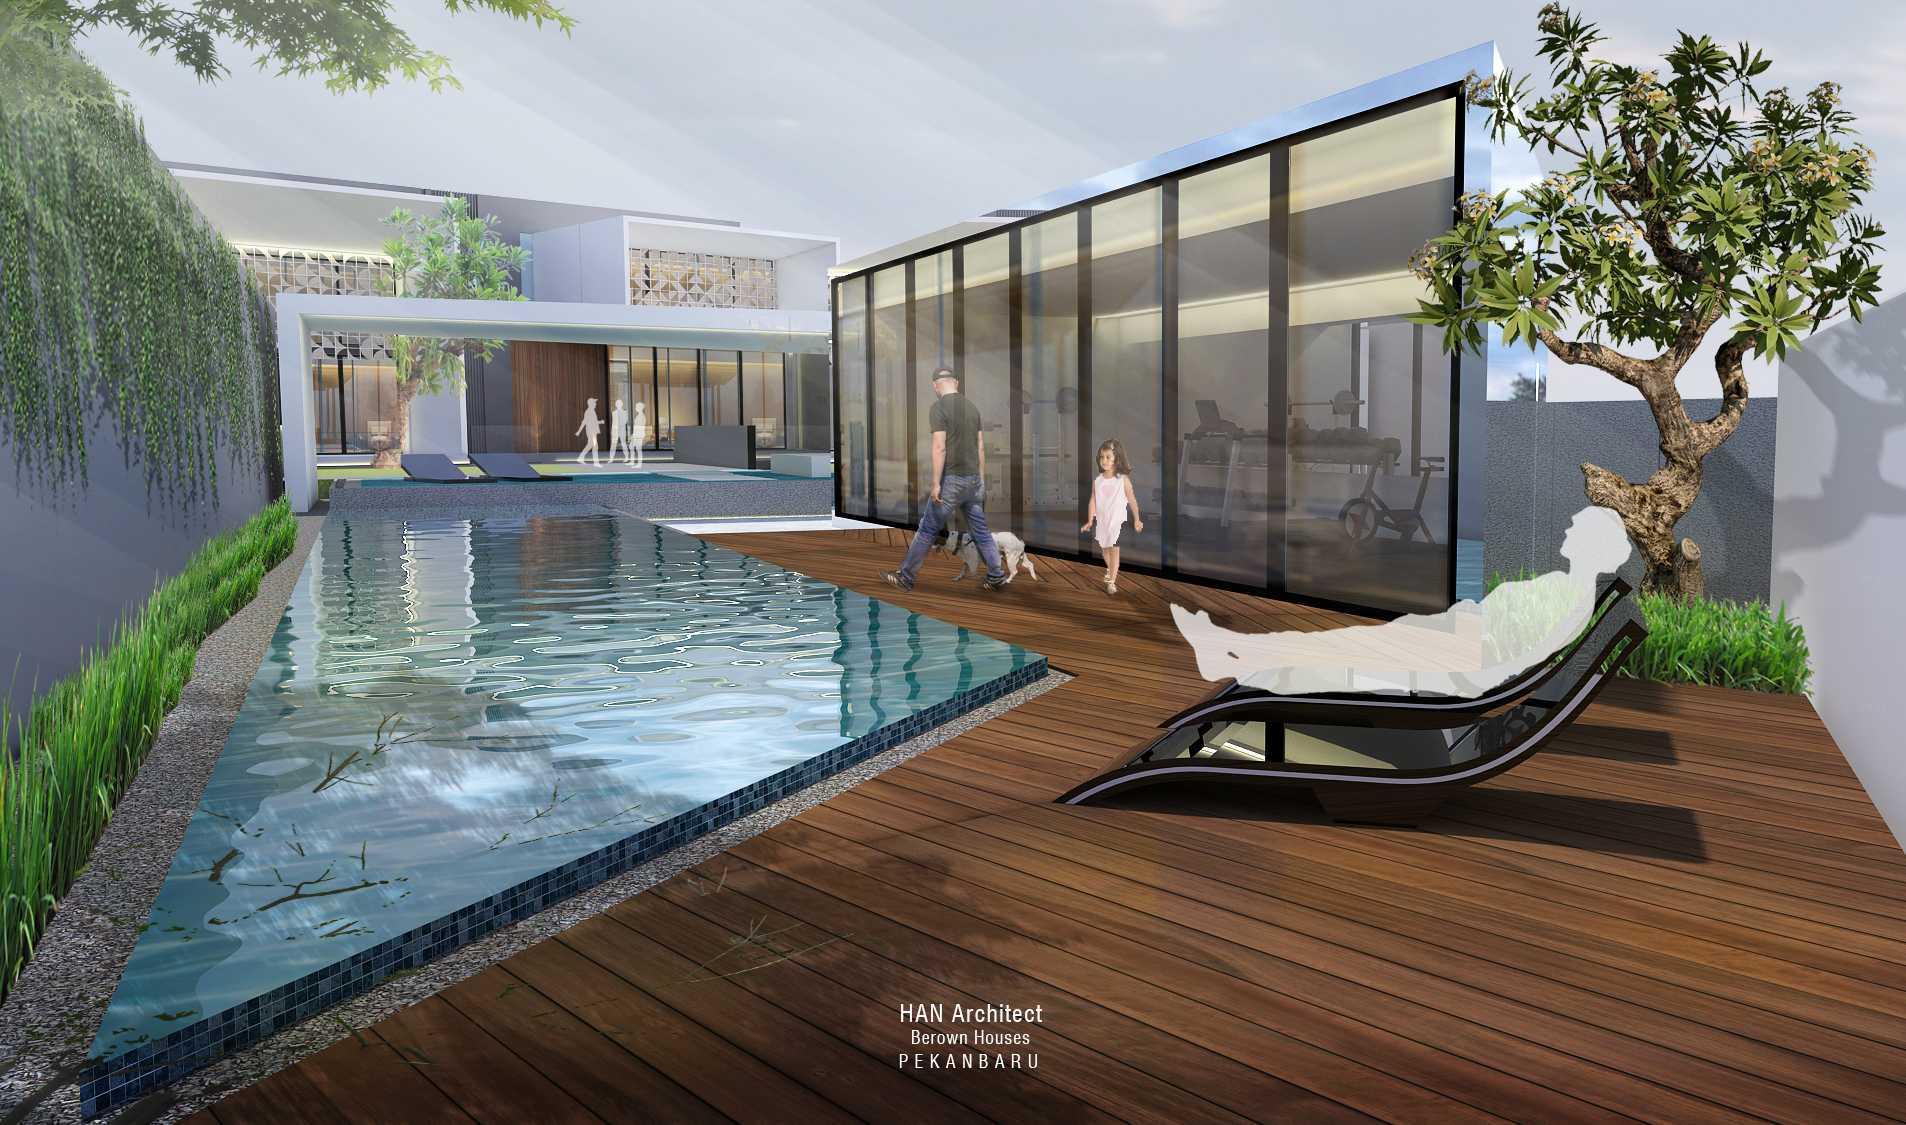 Han Architect Berown Houses Pekanbaru, Pekanbaru City, Riau, Indonesia Pekanbaru 4Jpg   27913